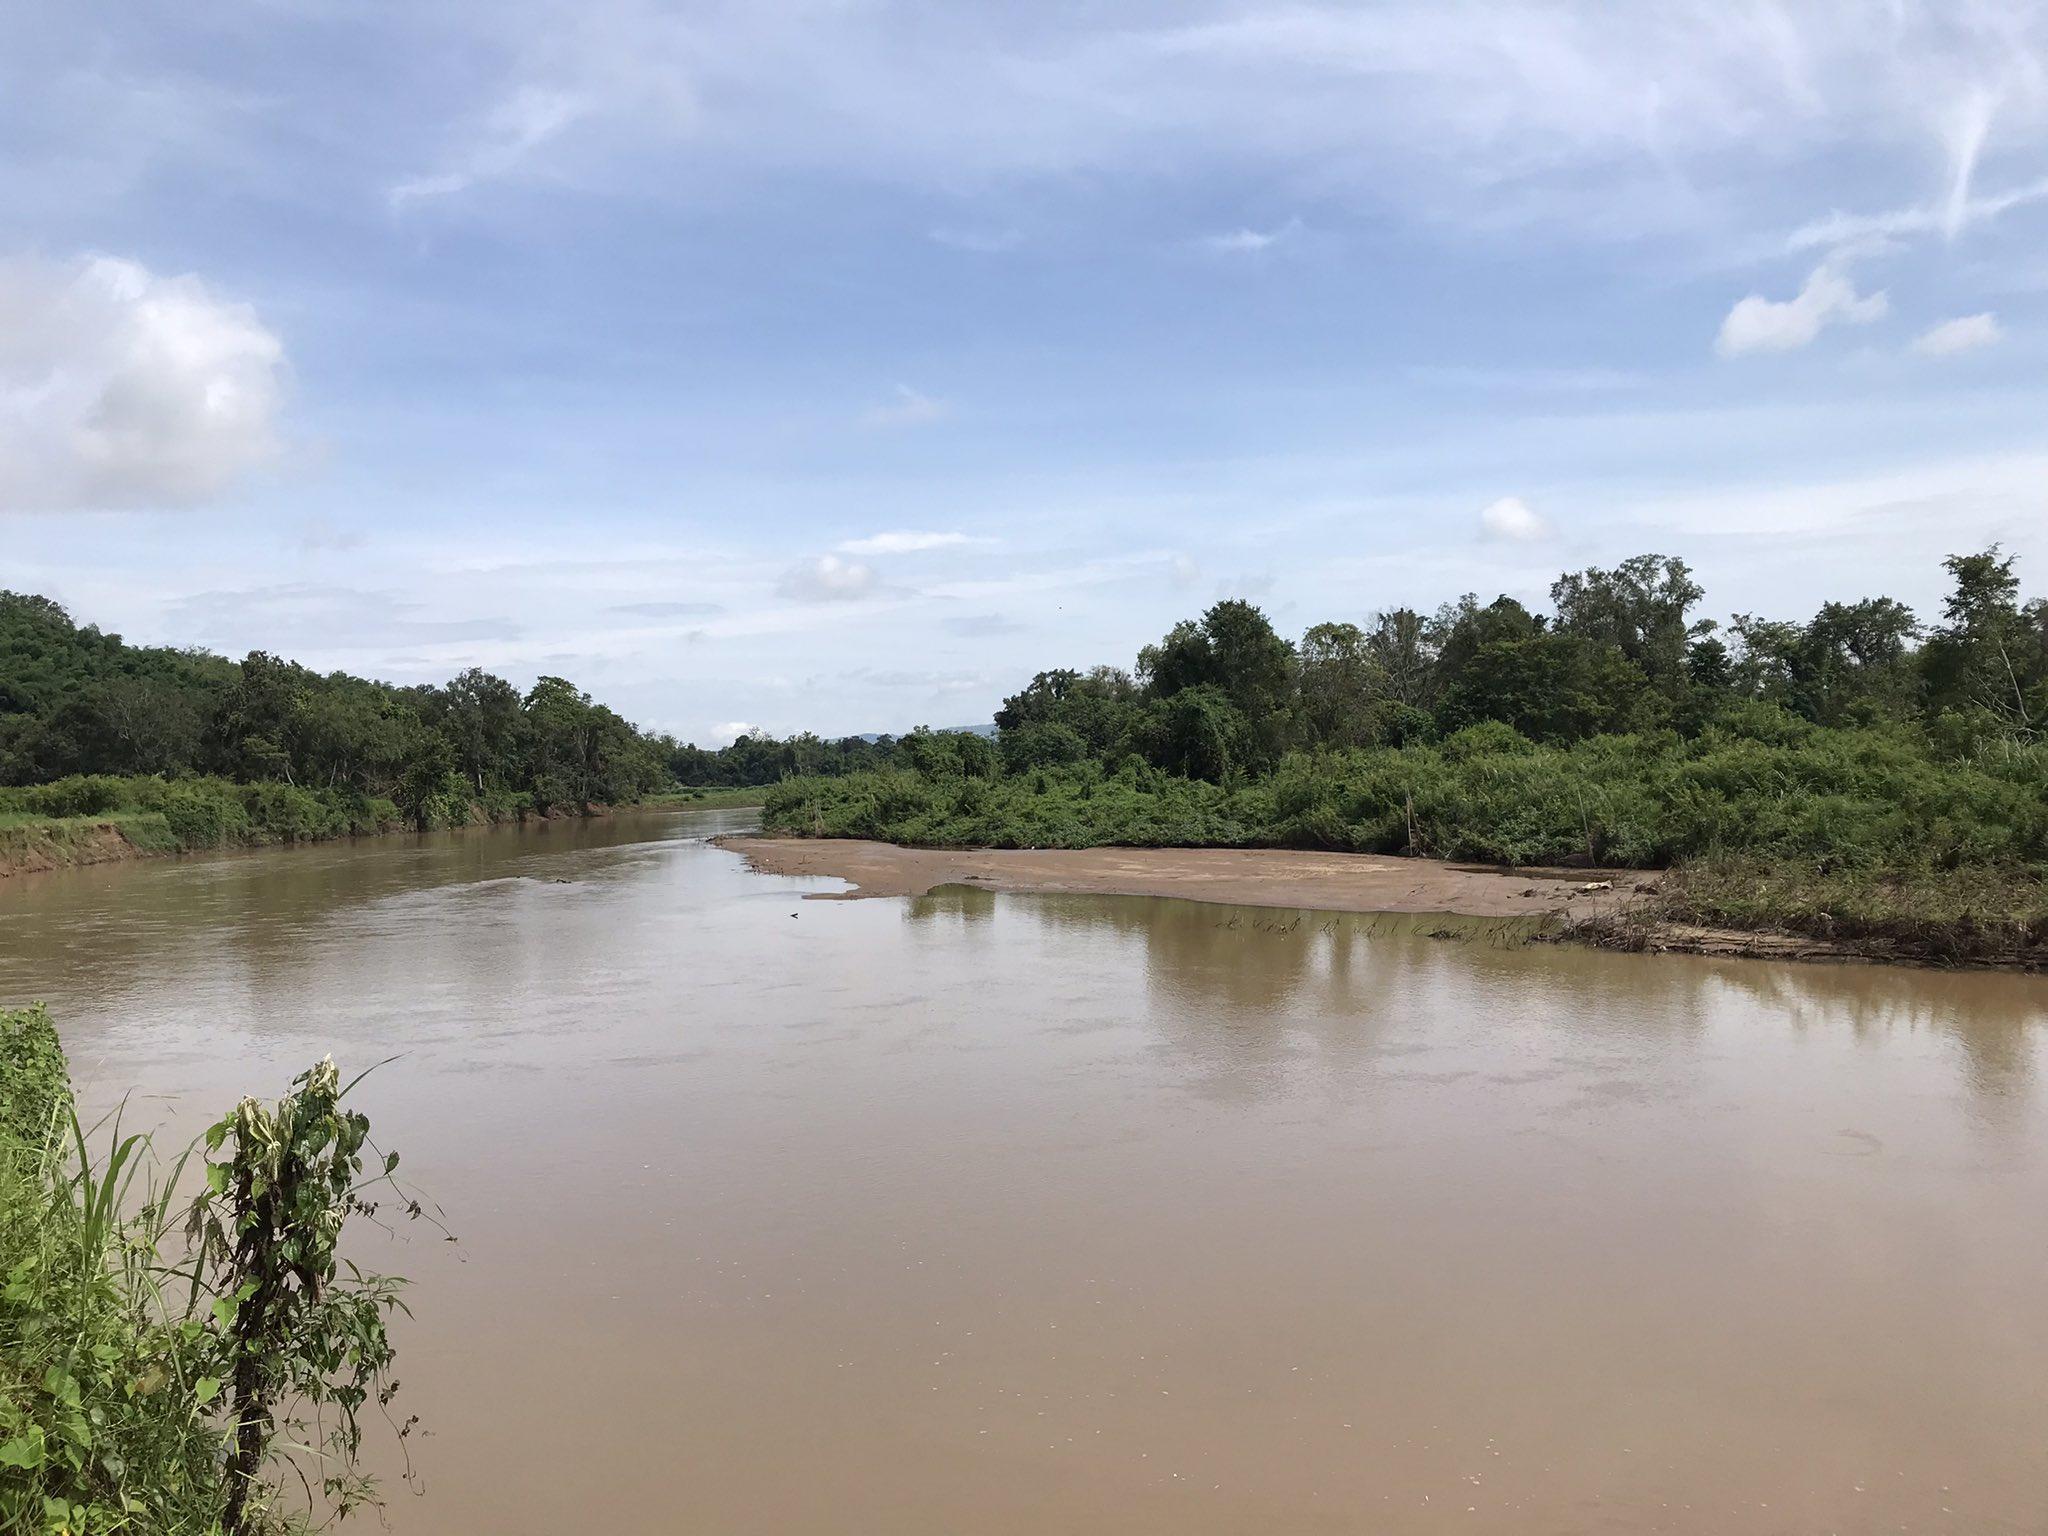 Sandbanks showing on the river Ruak during the rainy season, July 2021